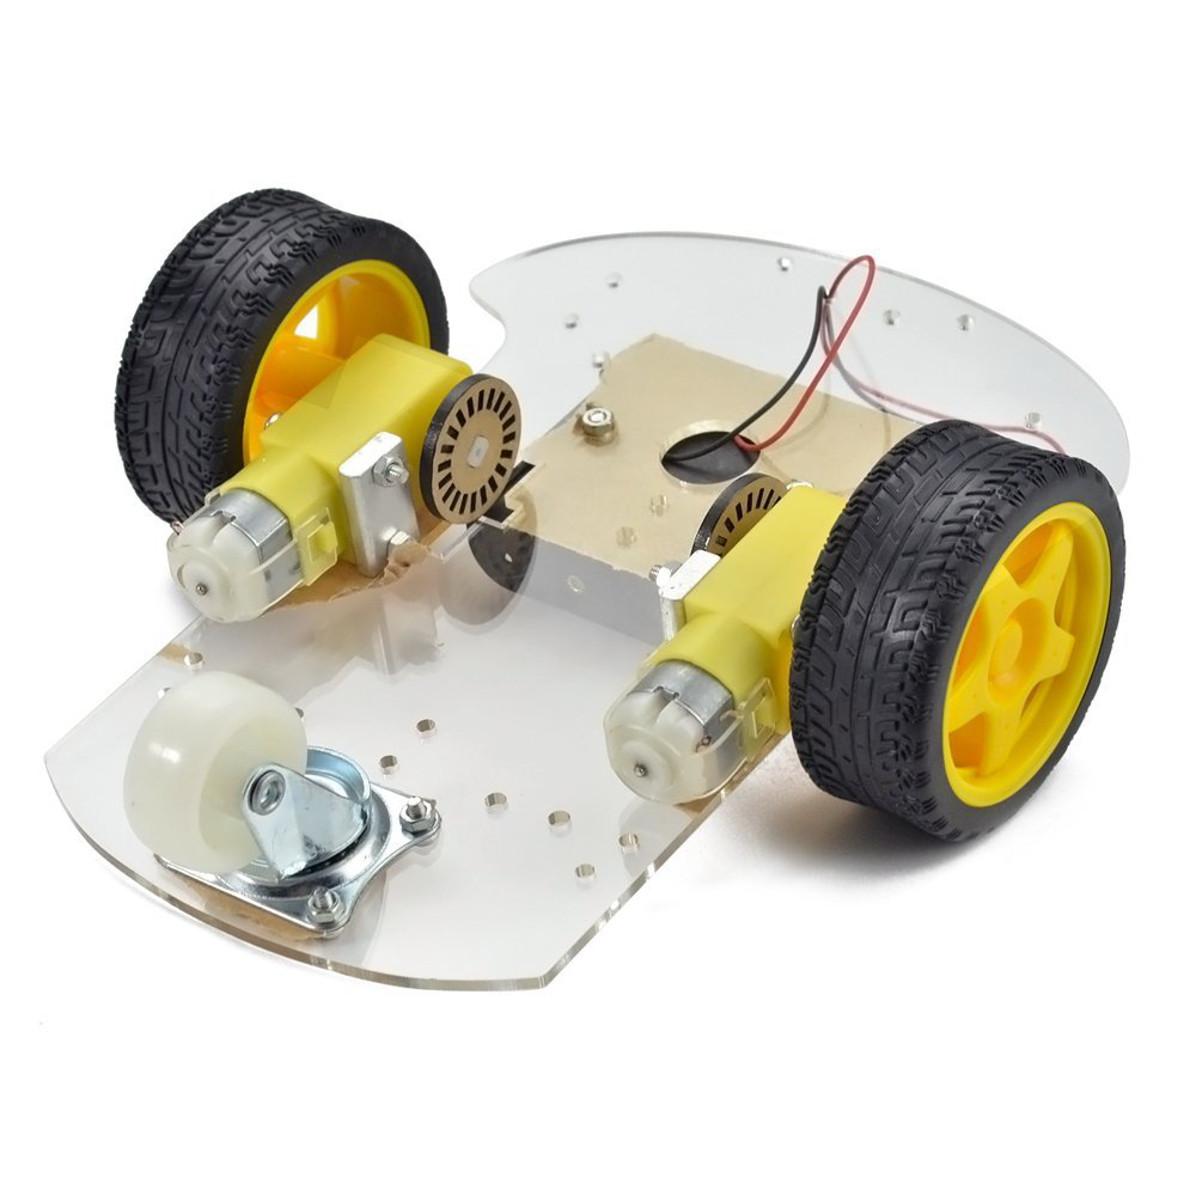 2WD Mini Rotonda Double-Deck Smart Robot Car Chassis Kit FAI DA TE Arduino 15x 14x 8 CM Robot Intelligente Kit FAI DA TE Car Chassis